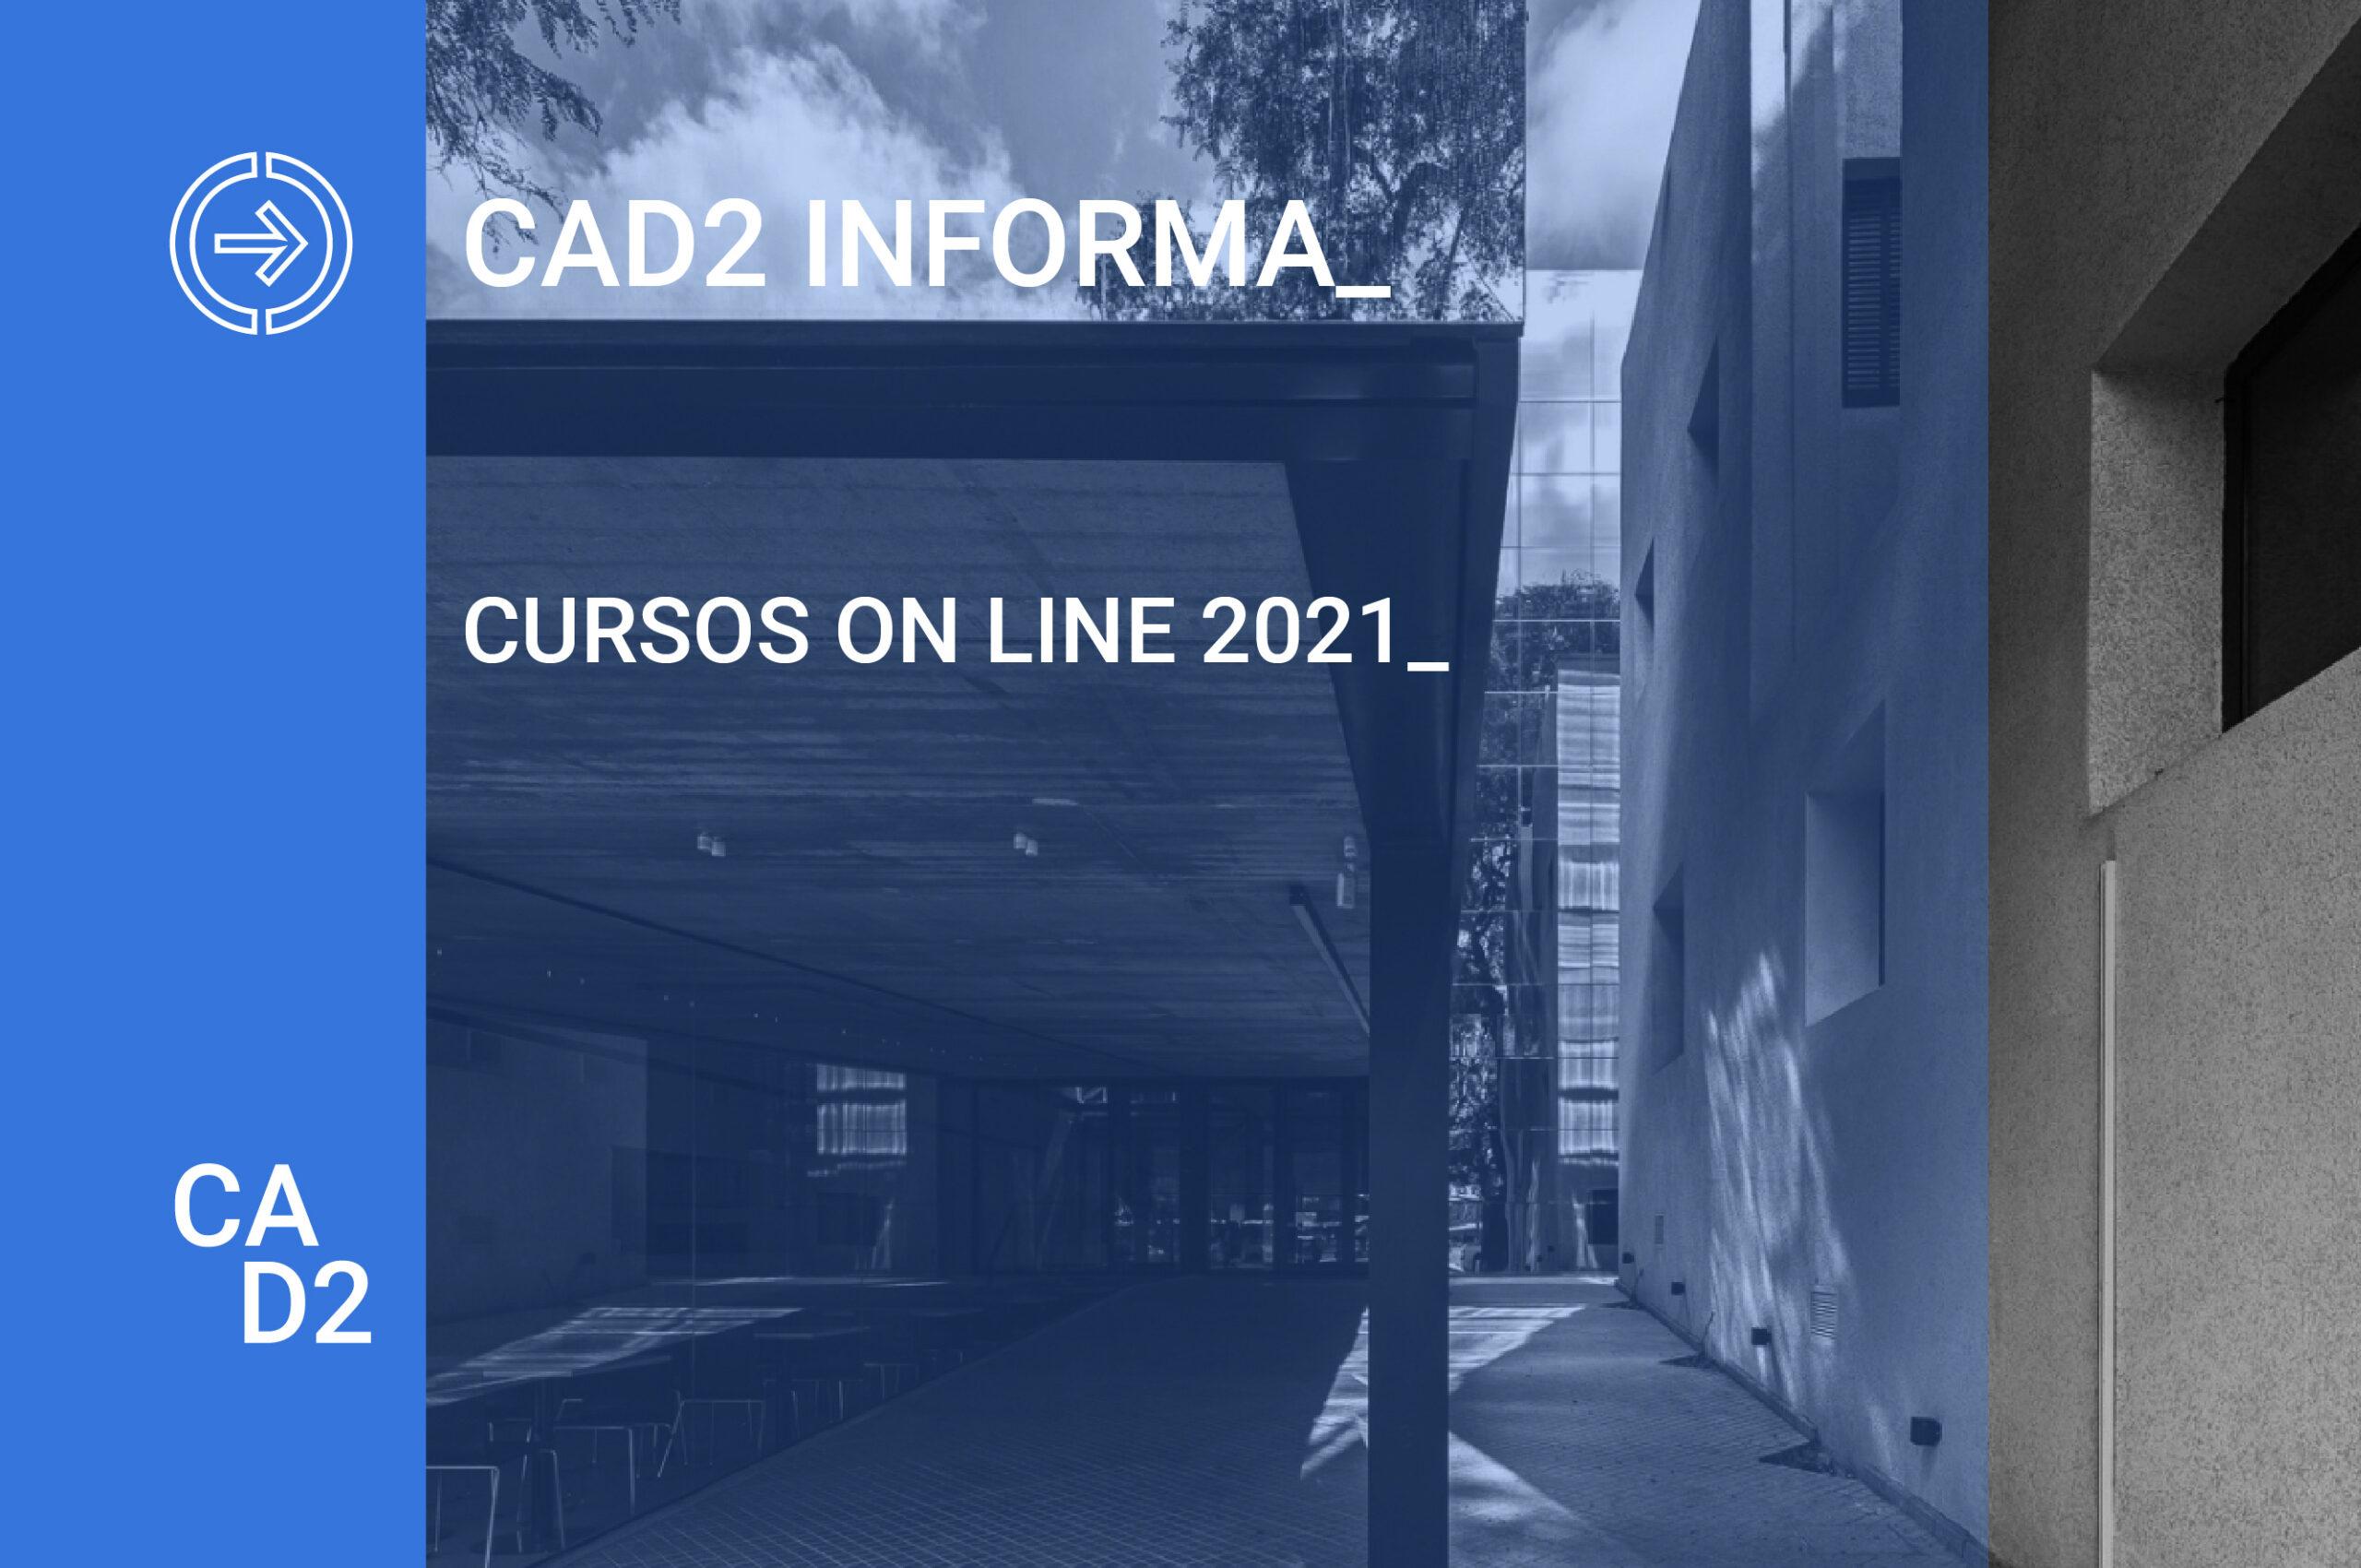 CURSOS ON LINE 2021